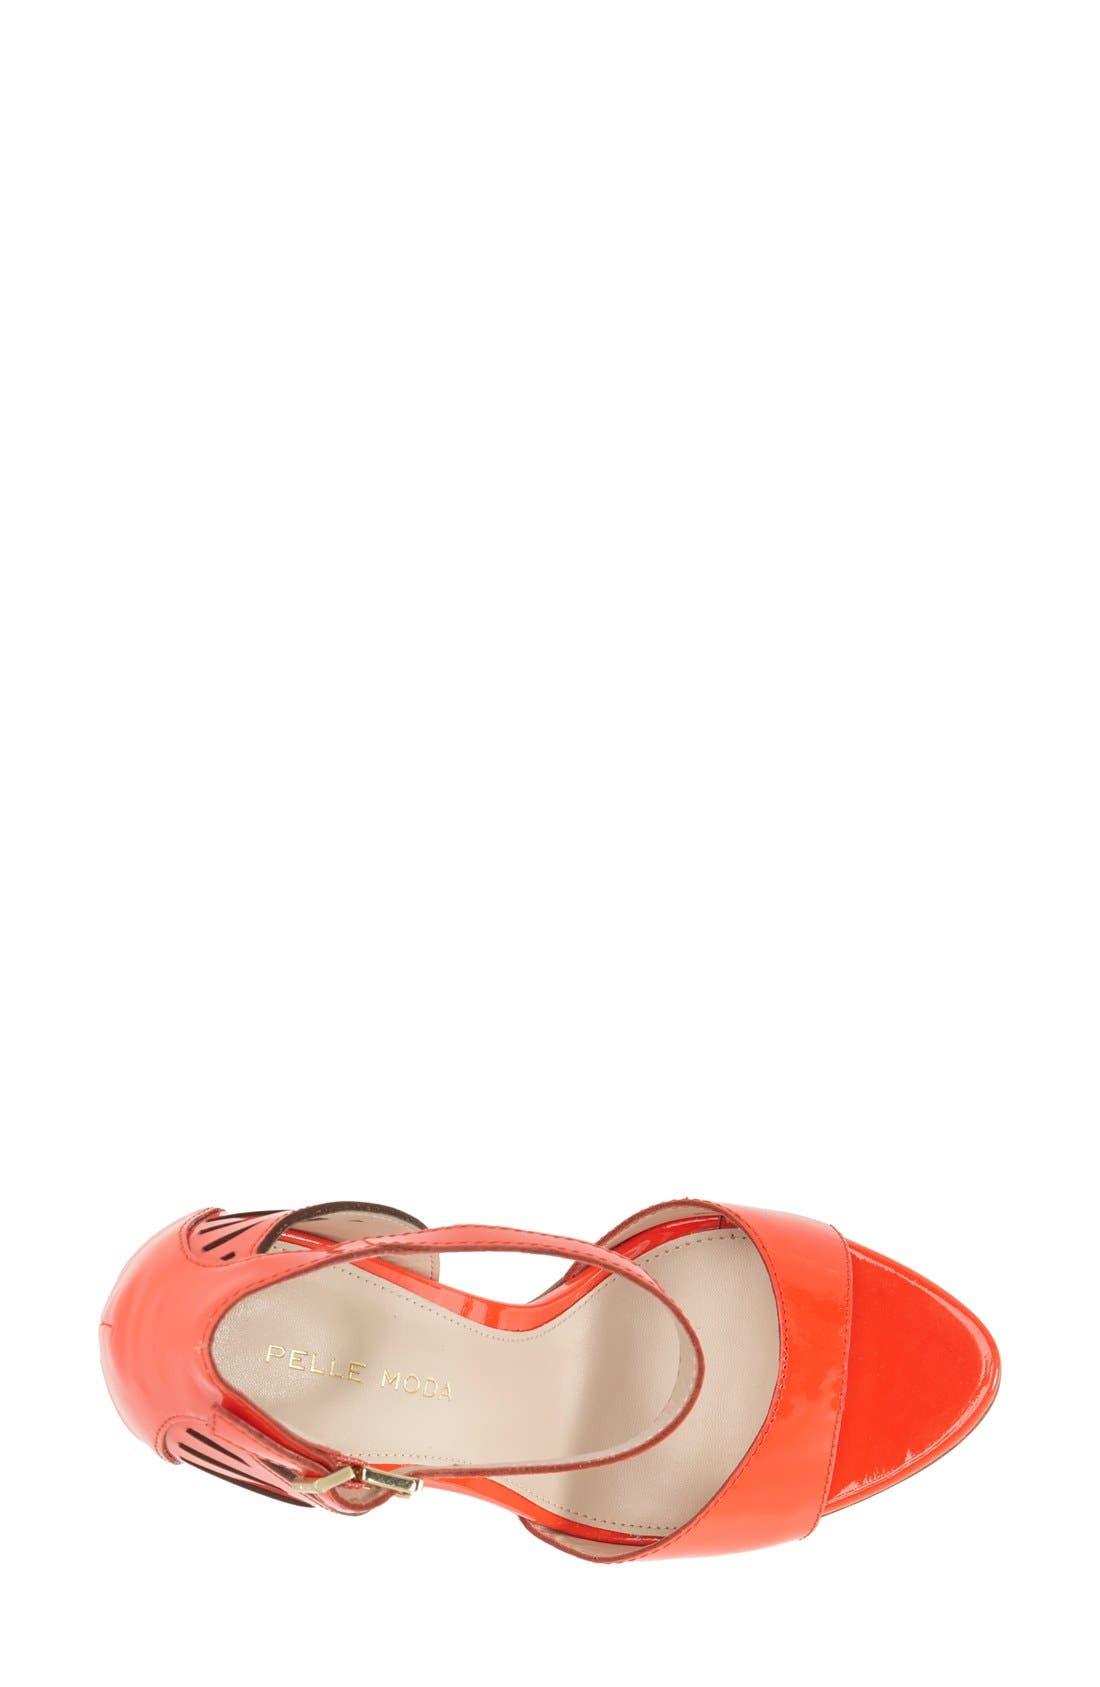 'Fenton' Ankle Strap Sandal,                             Alternate thumbnail 20, color,